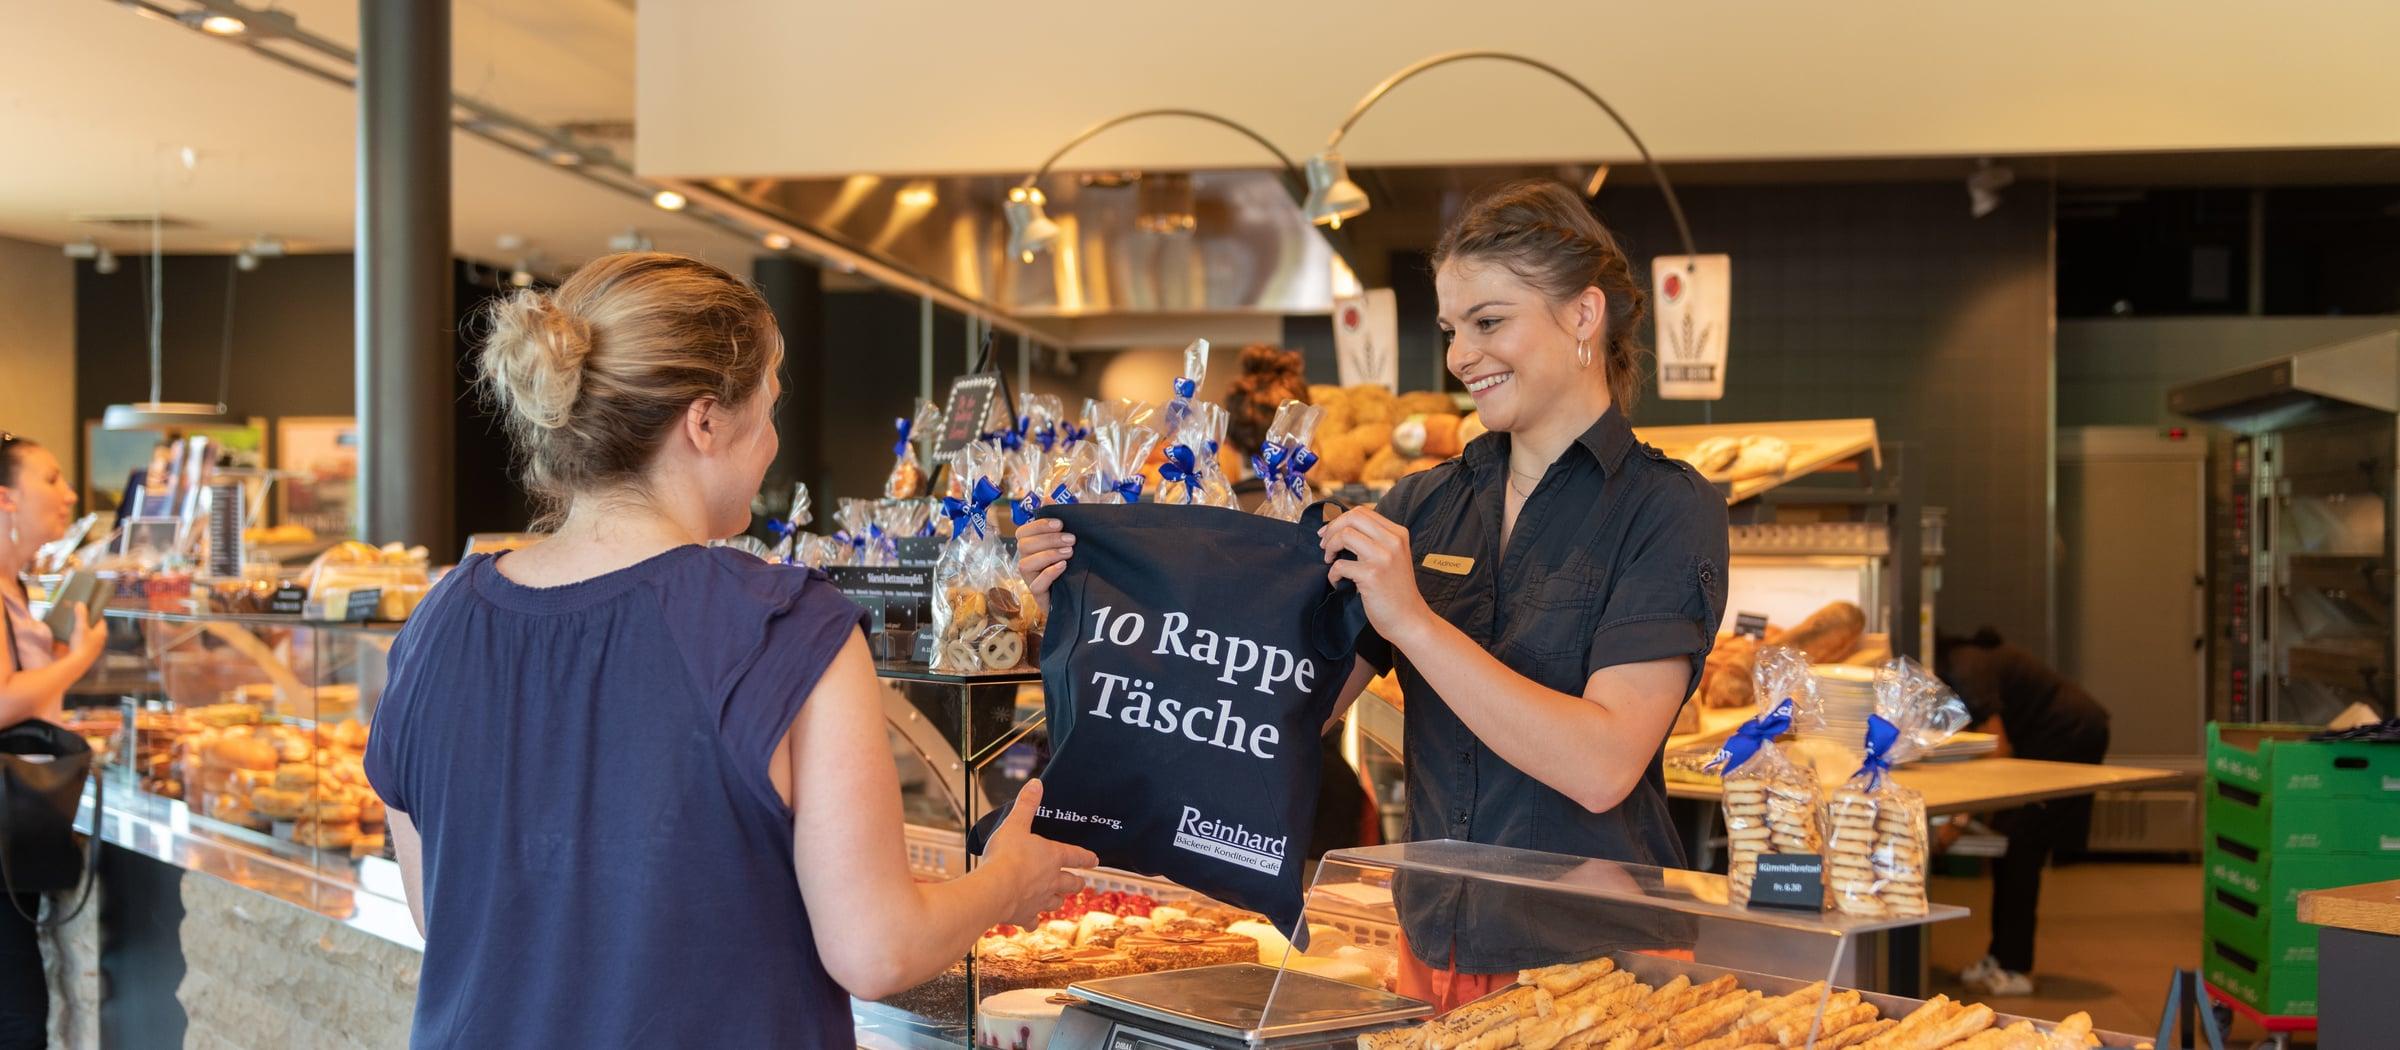 Baeckerei Reinhard AG Inspiration Food Waste